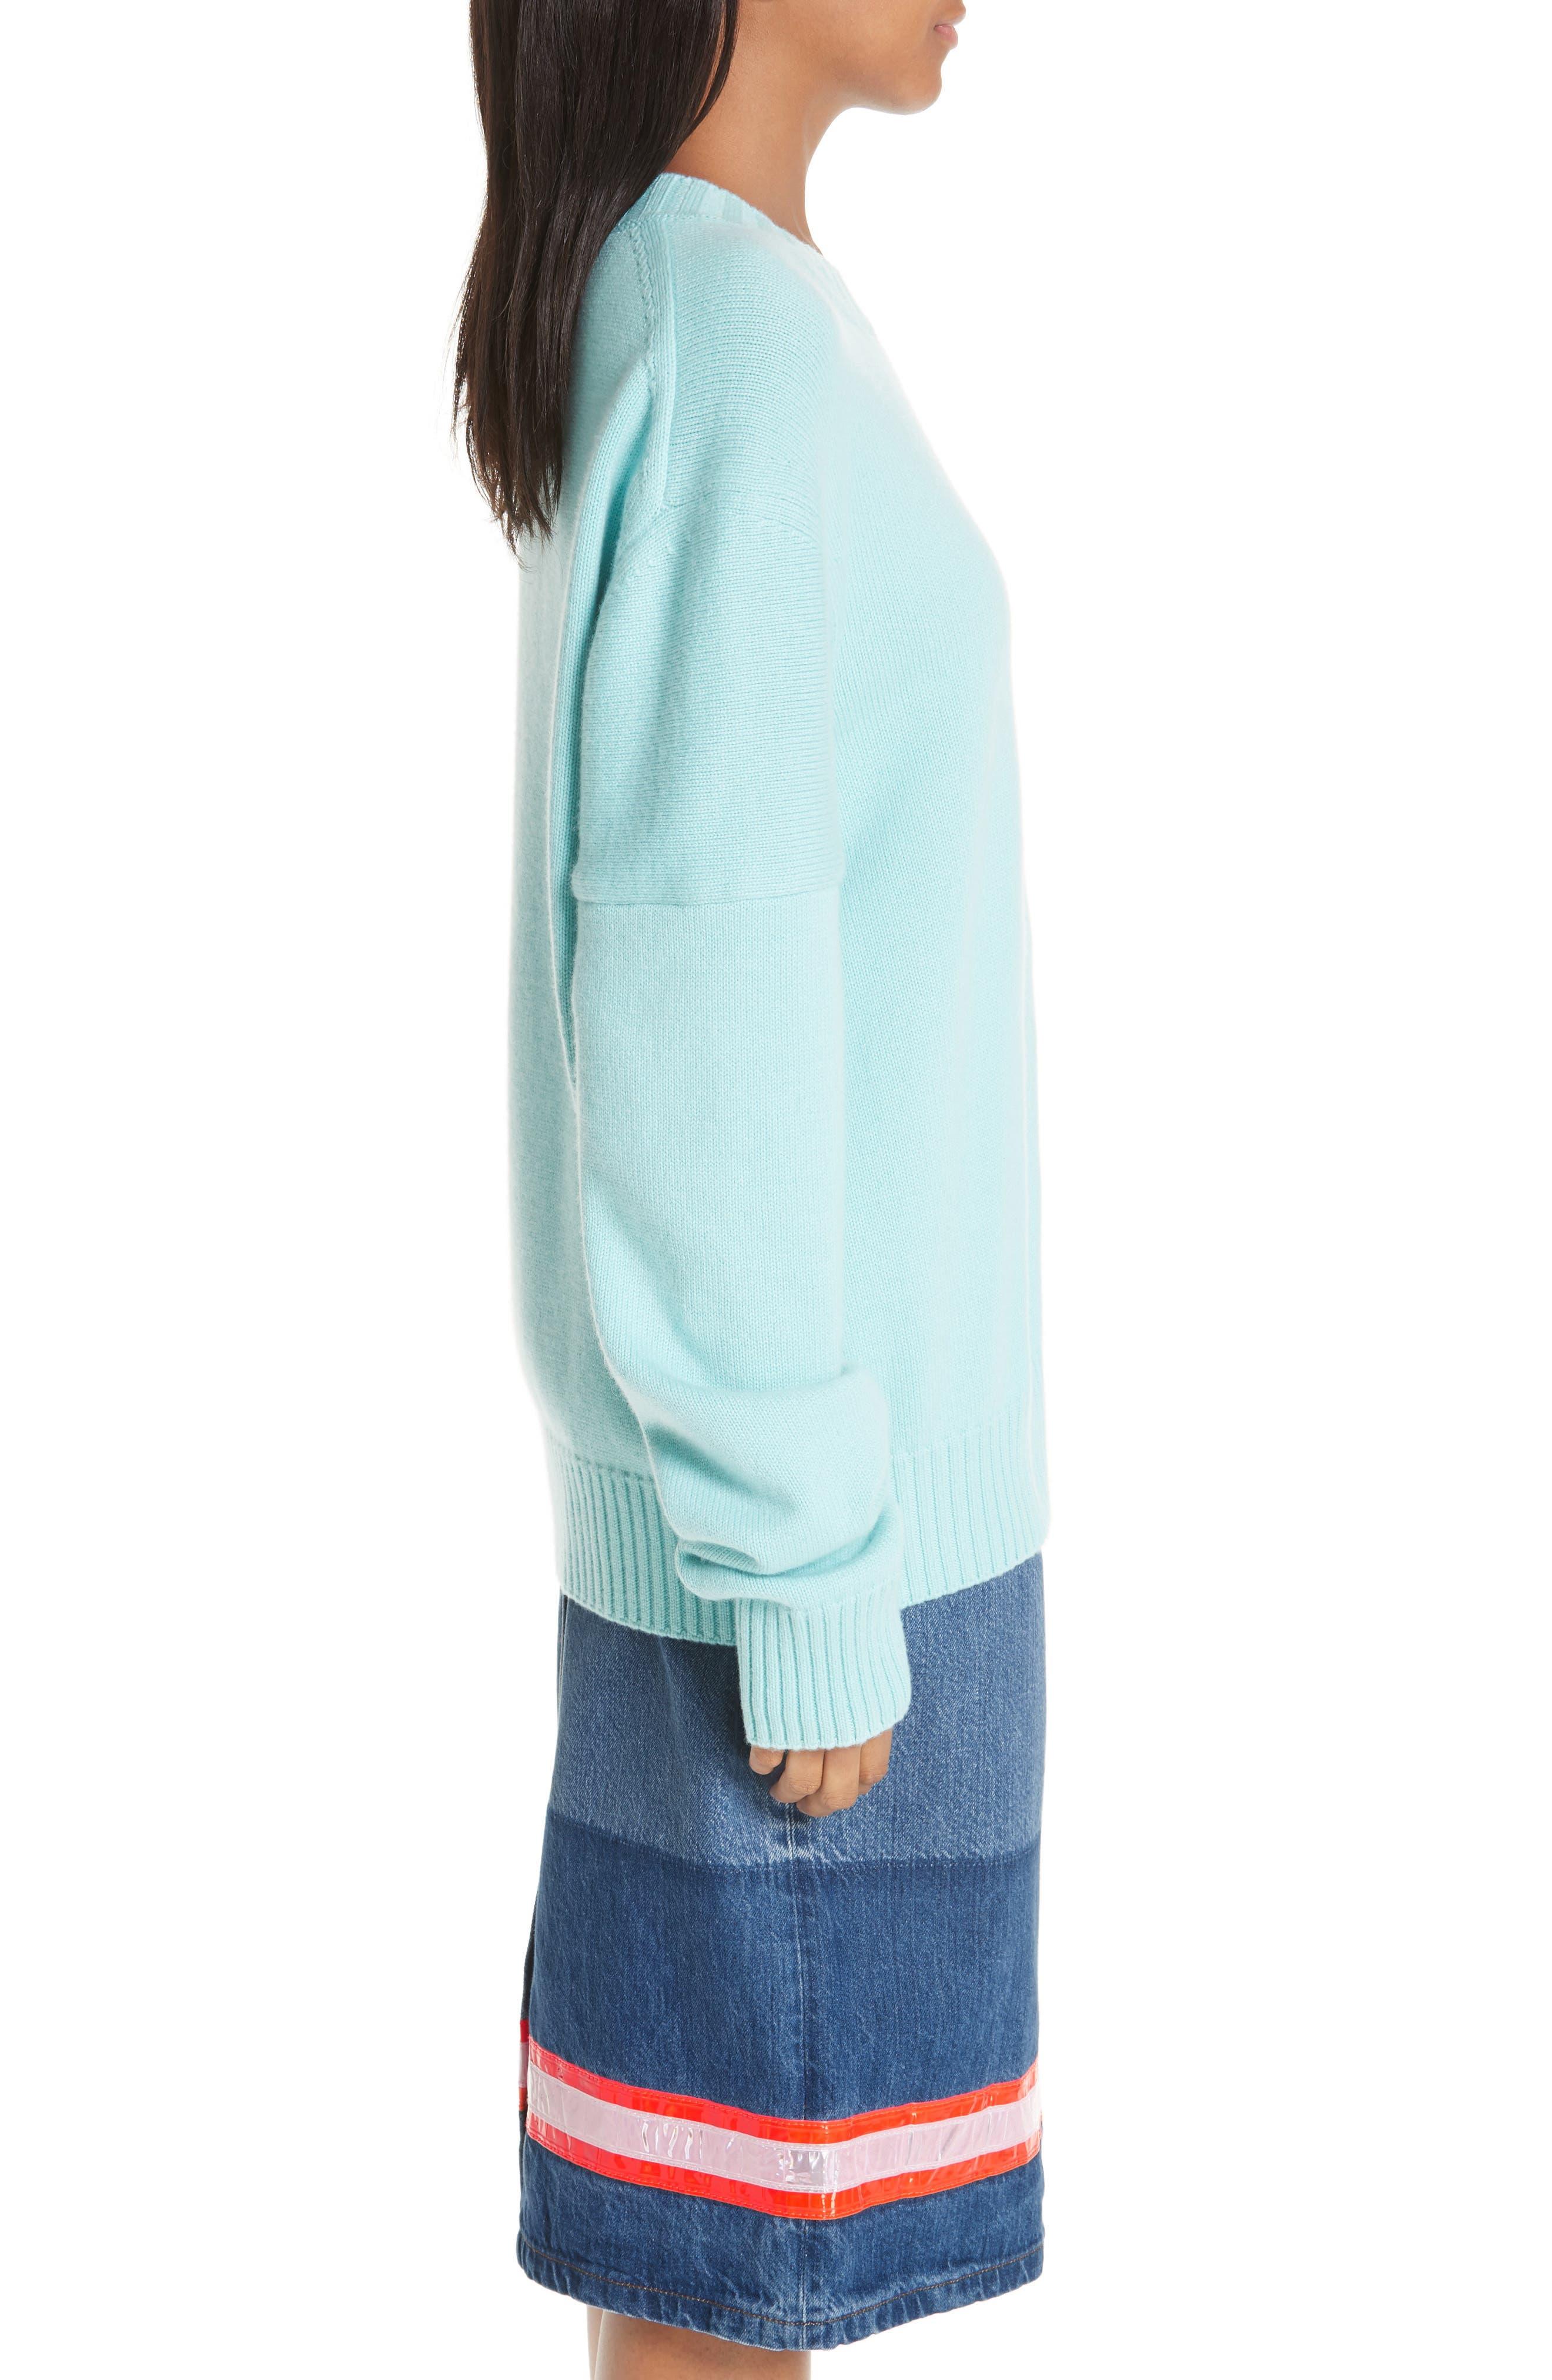 CALVIN KLEIN 205W39NYC, Logo Cashmere Sweater, Alternate thumbnail 4, color, SKY BLUE